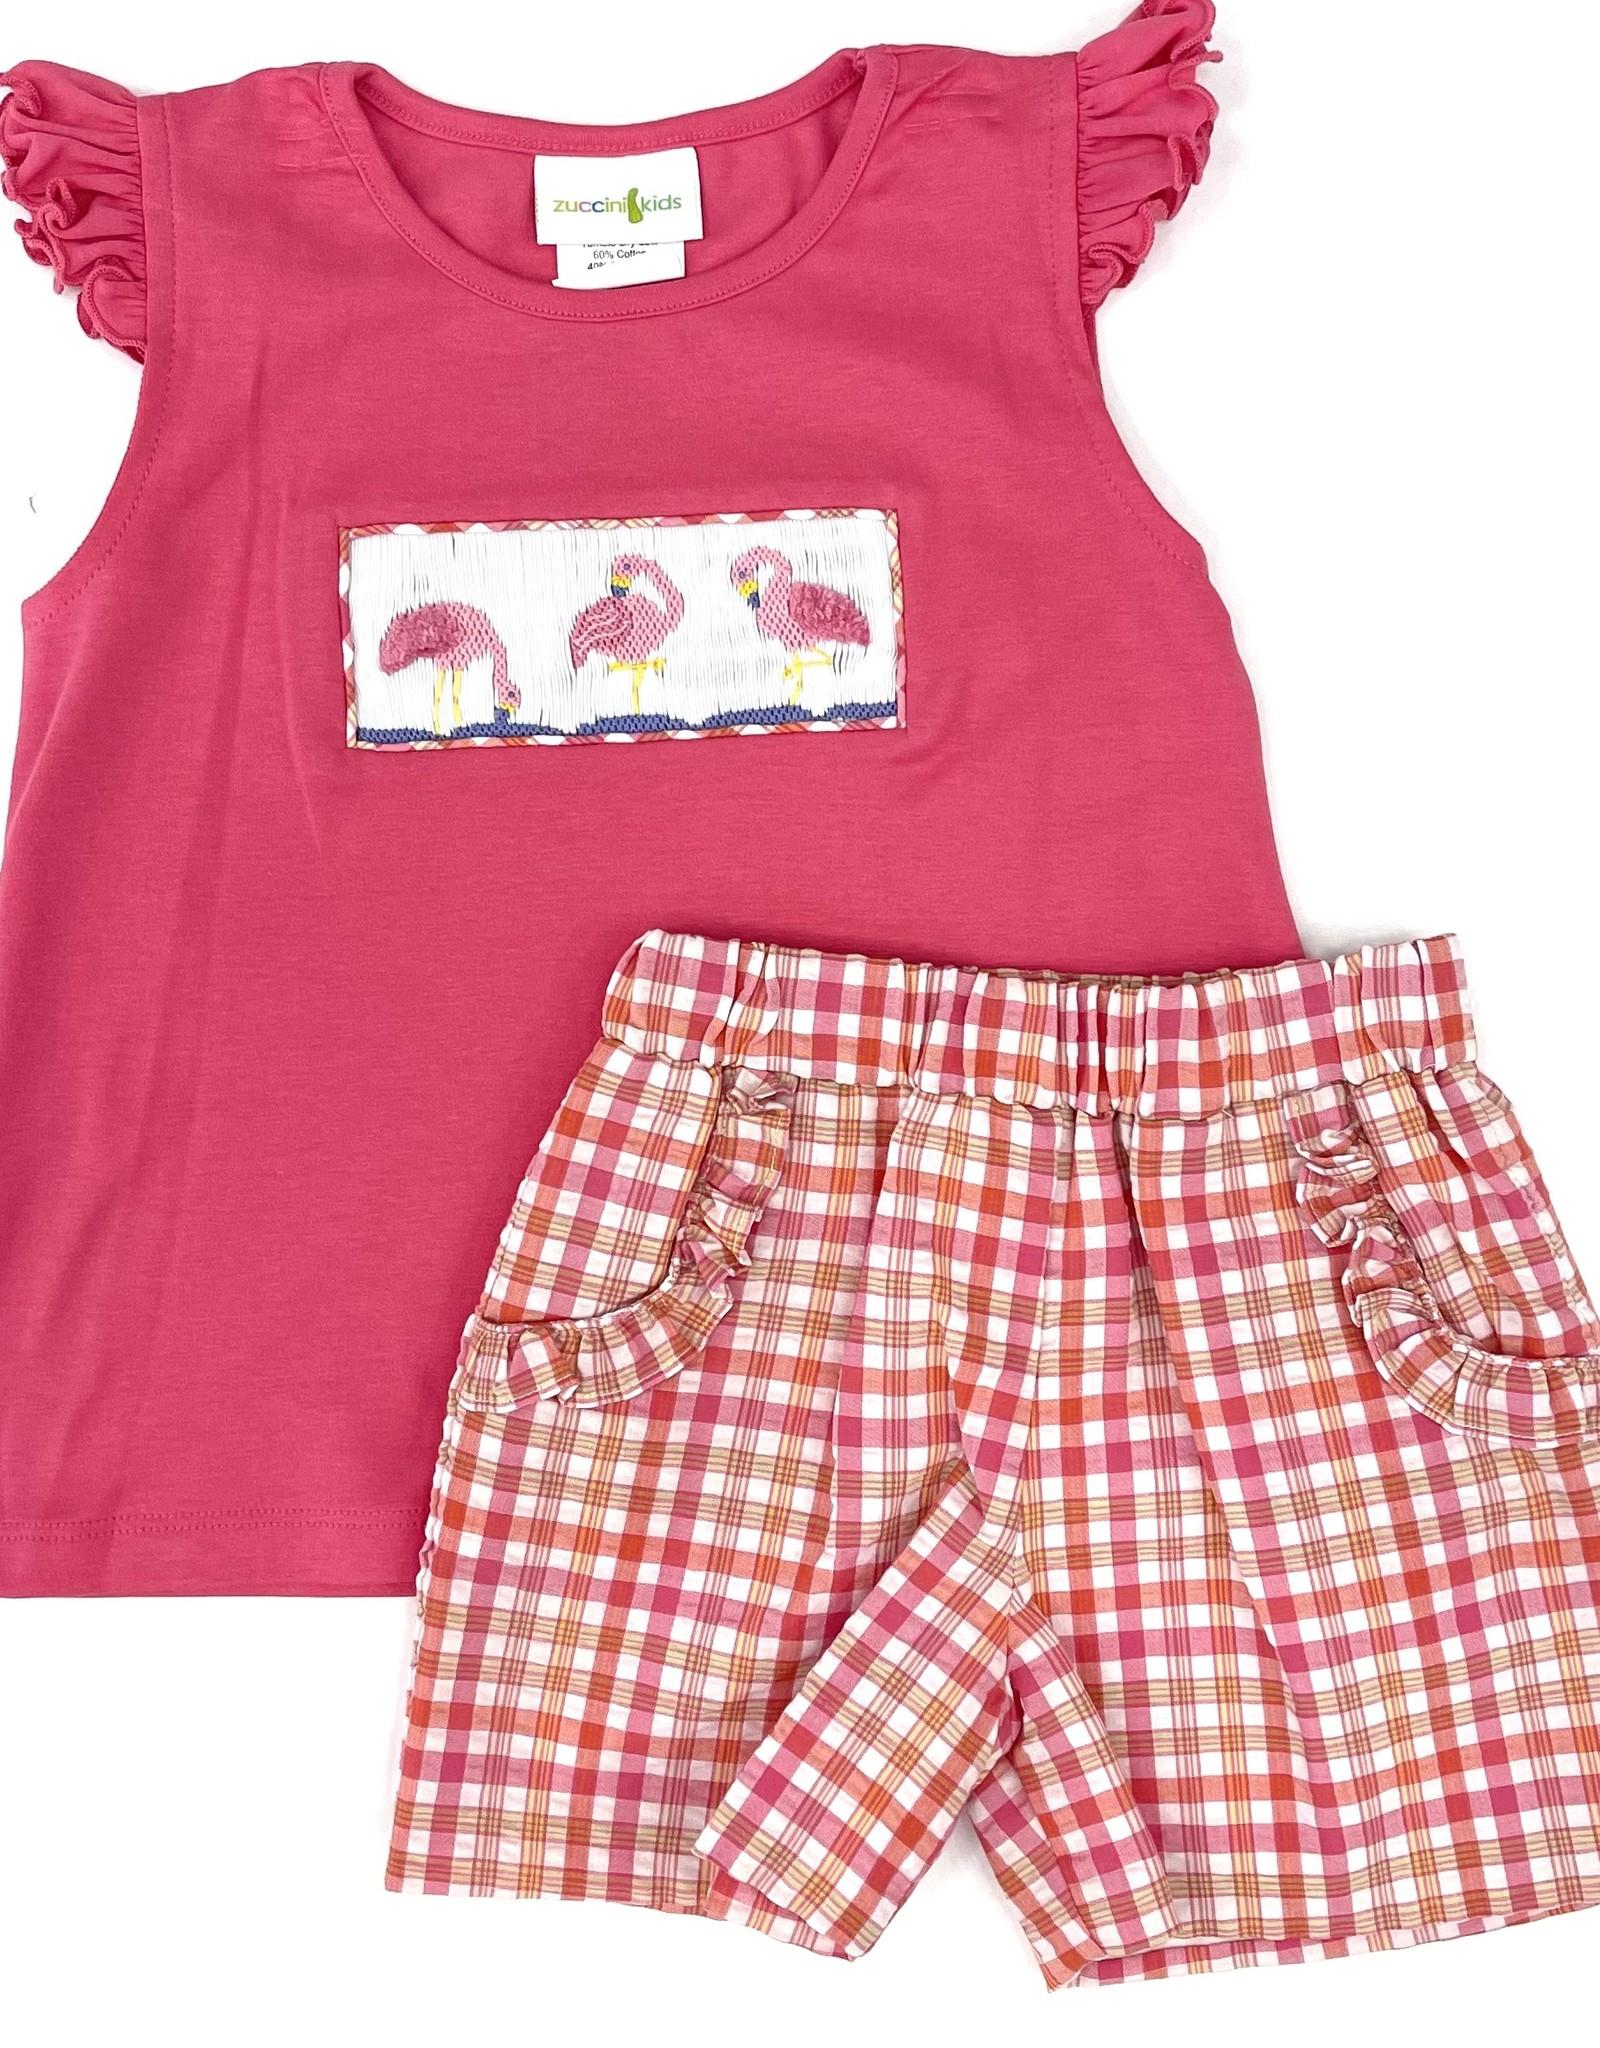 Zuccini Flamingo Knit Raffie Short Set